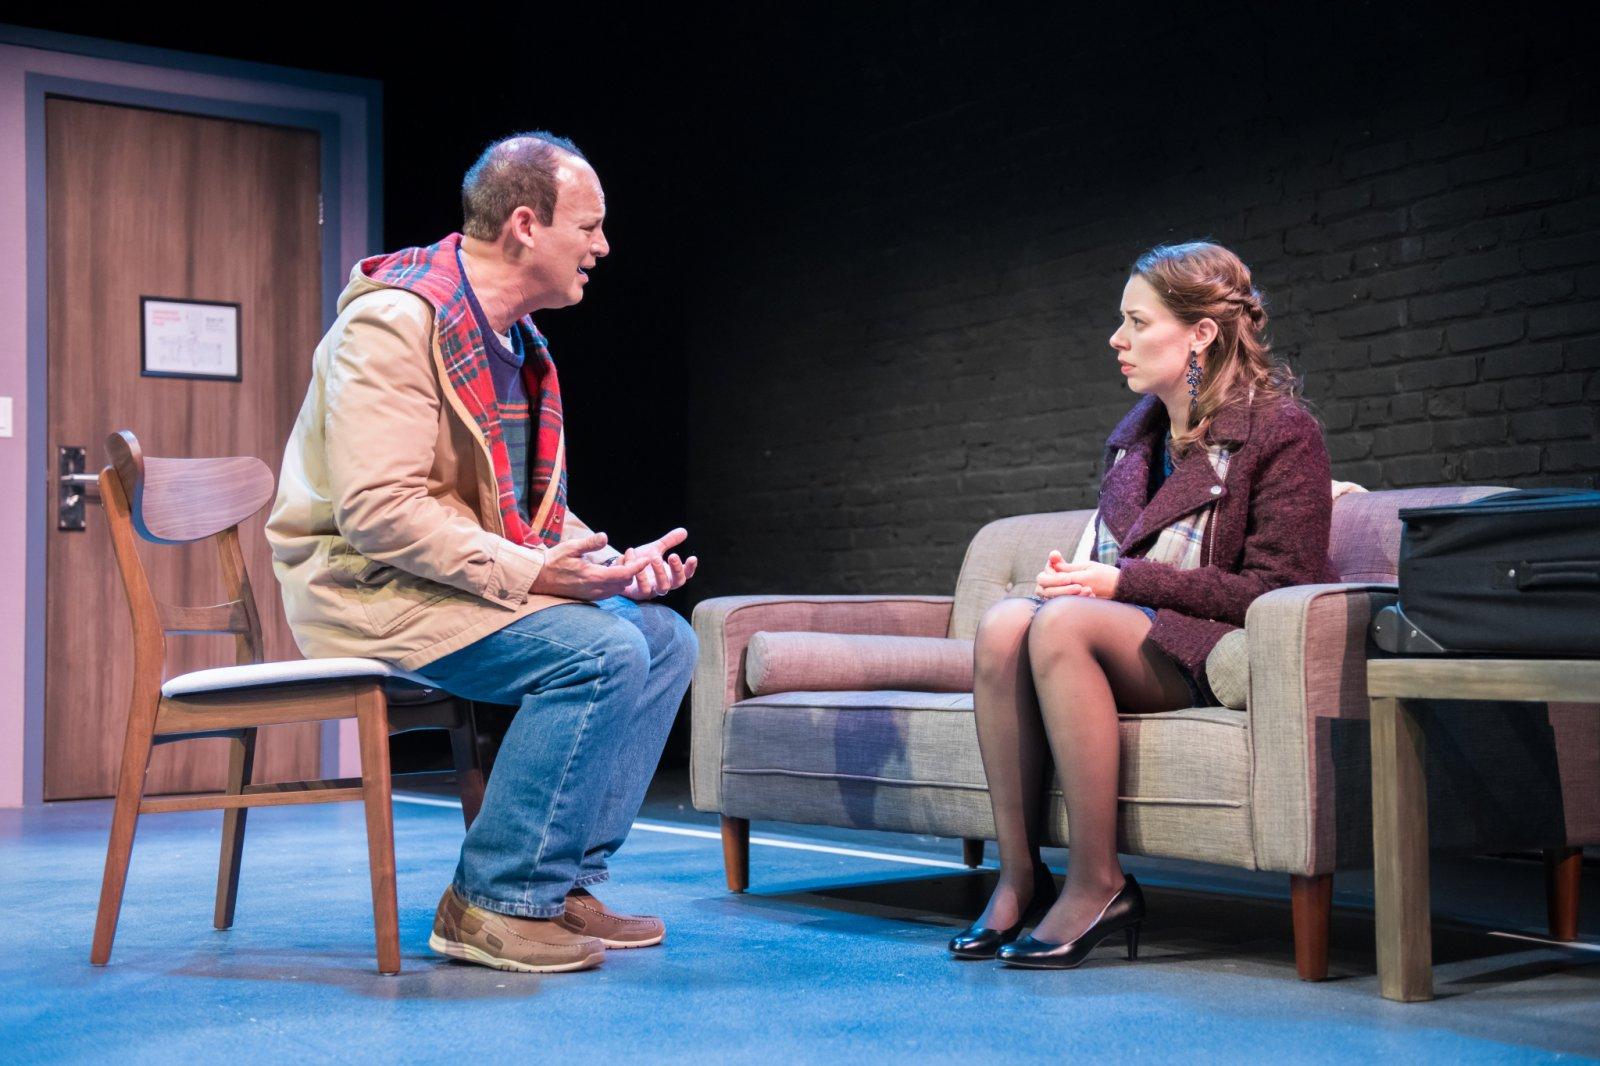 L-R: Tom Klubertanz as Terry McShane & Eva Nimmer as Kelly O'Rourke